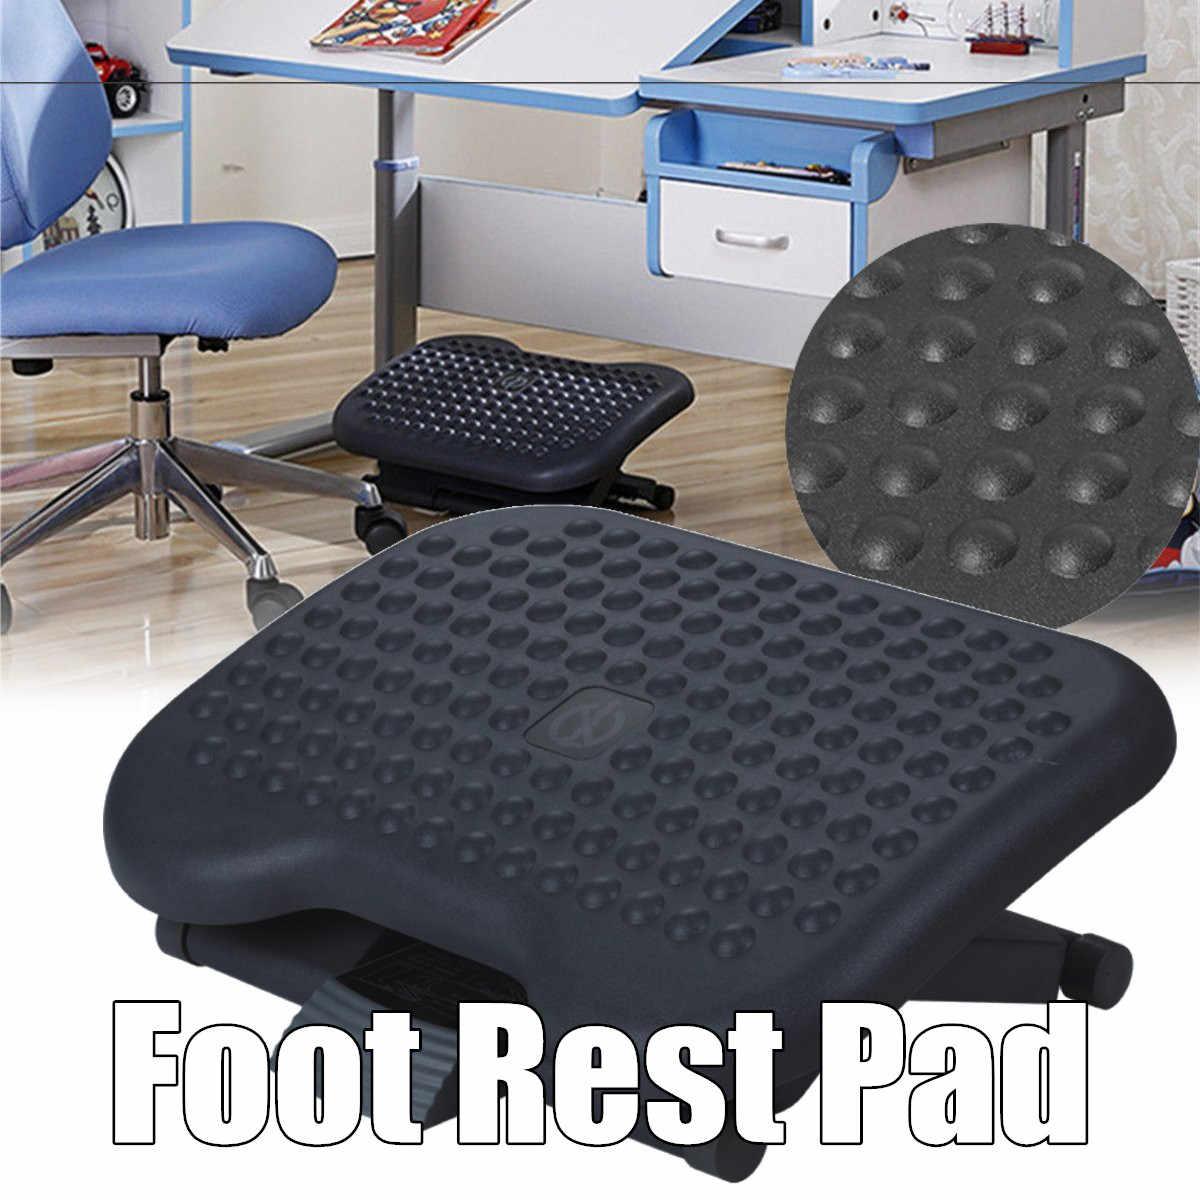 Adjustable Tilting Footrest Under Desk Ergonomic Massager Multifunction Foot Rest Pad Footstool Home Office Health Care Black Aliexpress